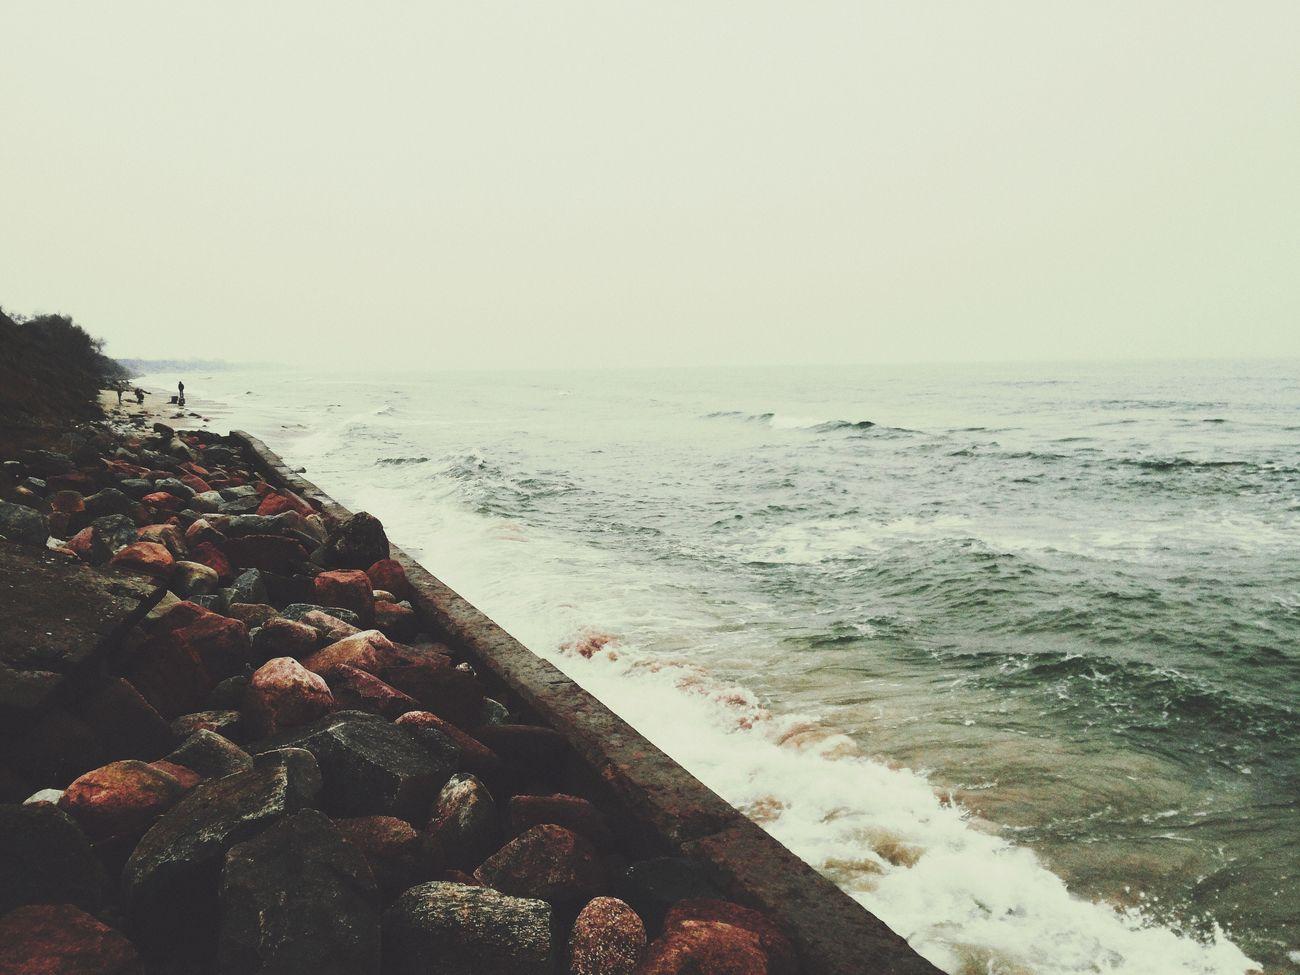 Walking Around Open Edit The Moment - 2015 EyeEm Awards Memories Follow Me EyeEm Best Shots EyeEm Best Edits Russia Sea Seaside